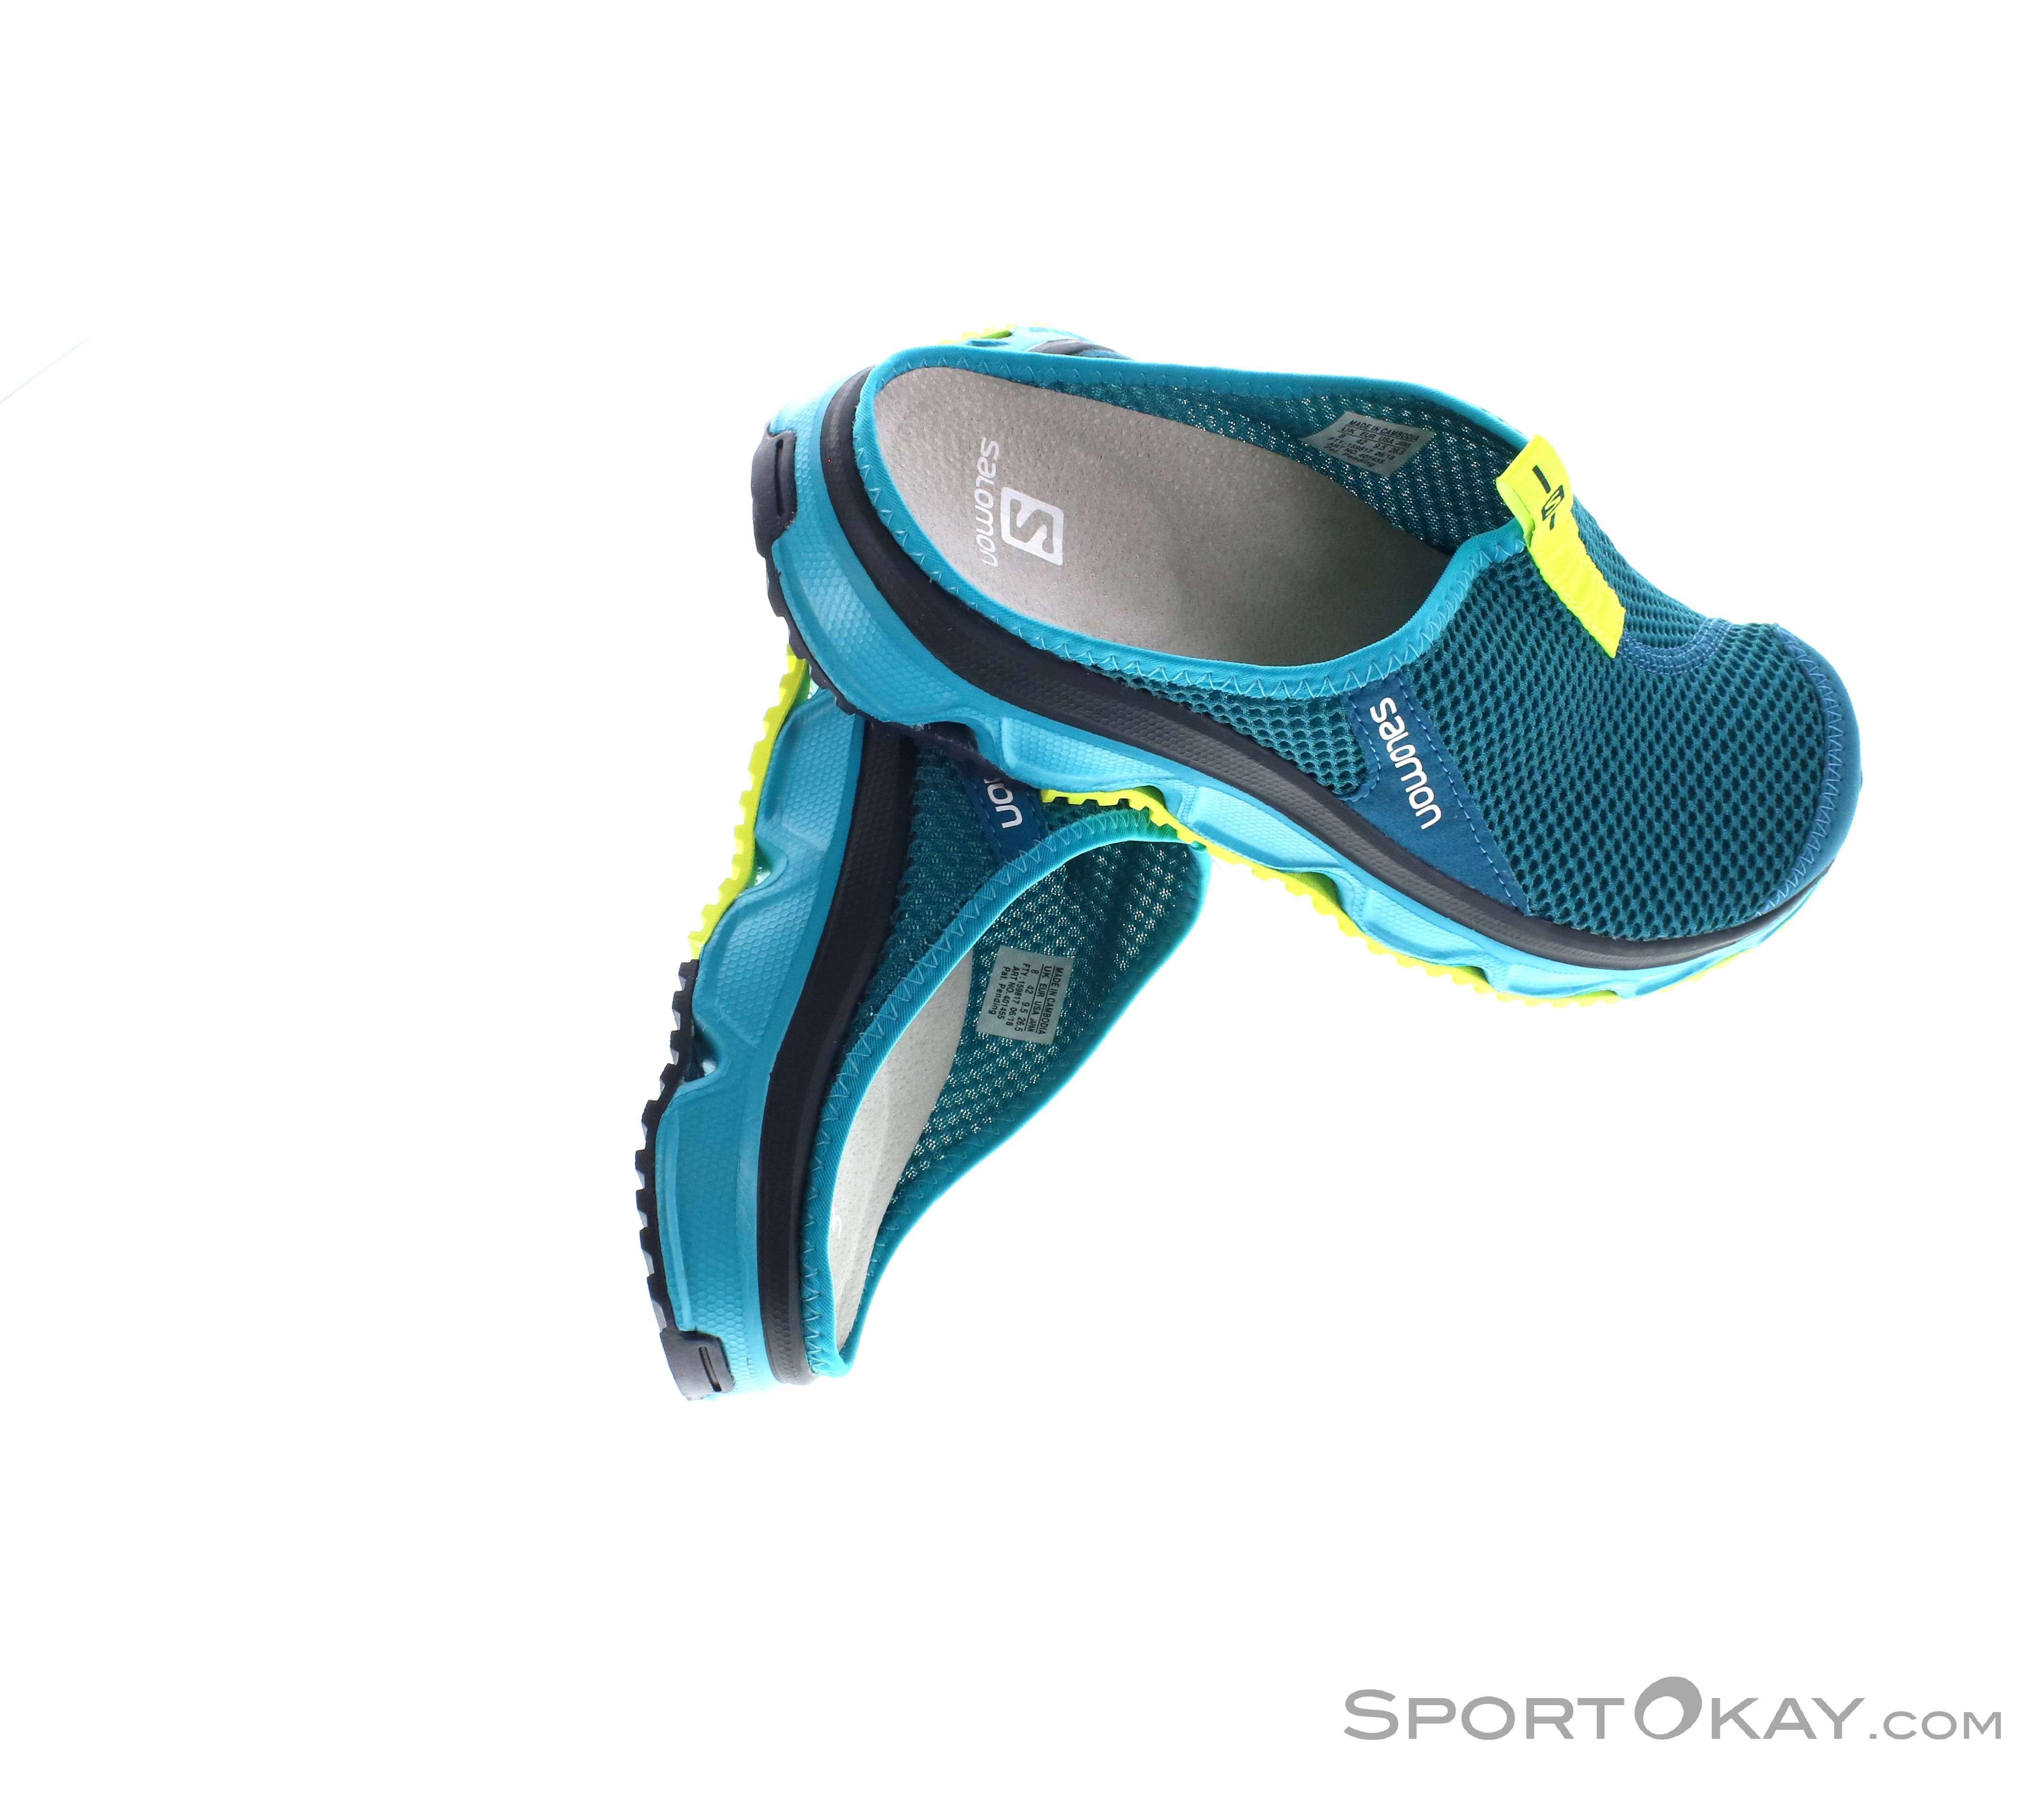 Salomon Salomon RX Slide 3.0 Womens Leisure Sandals